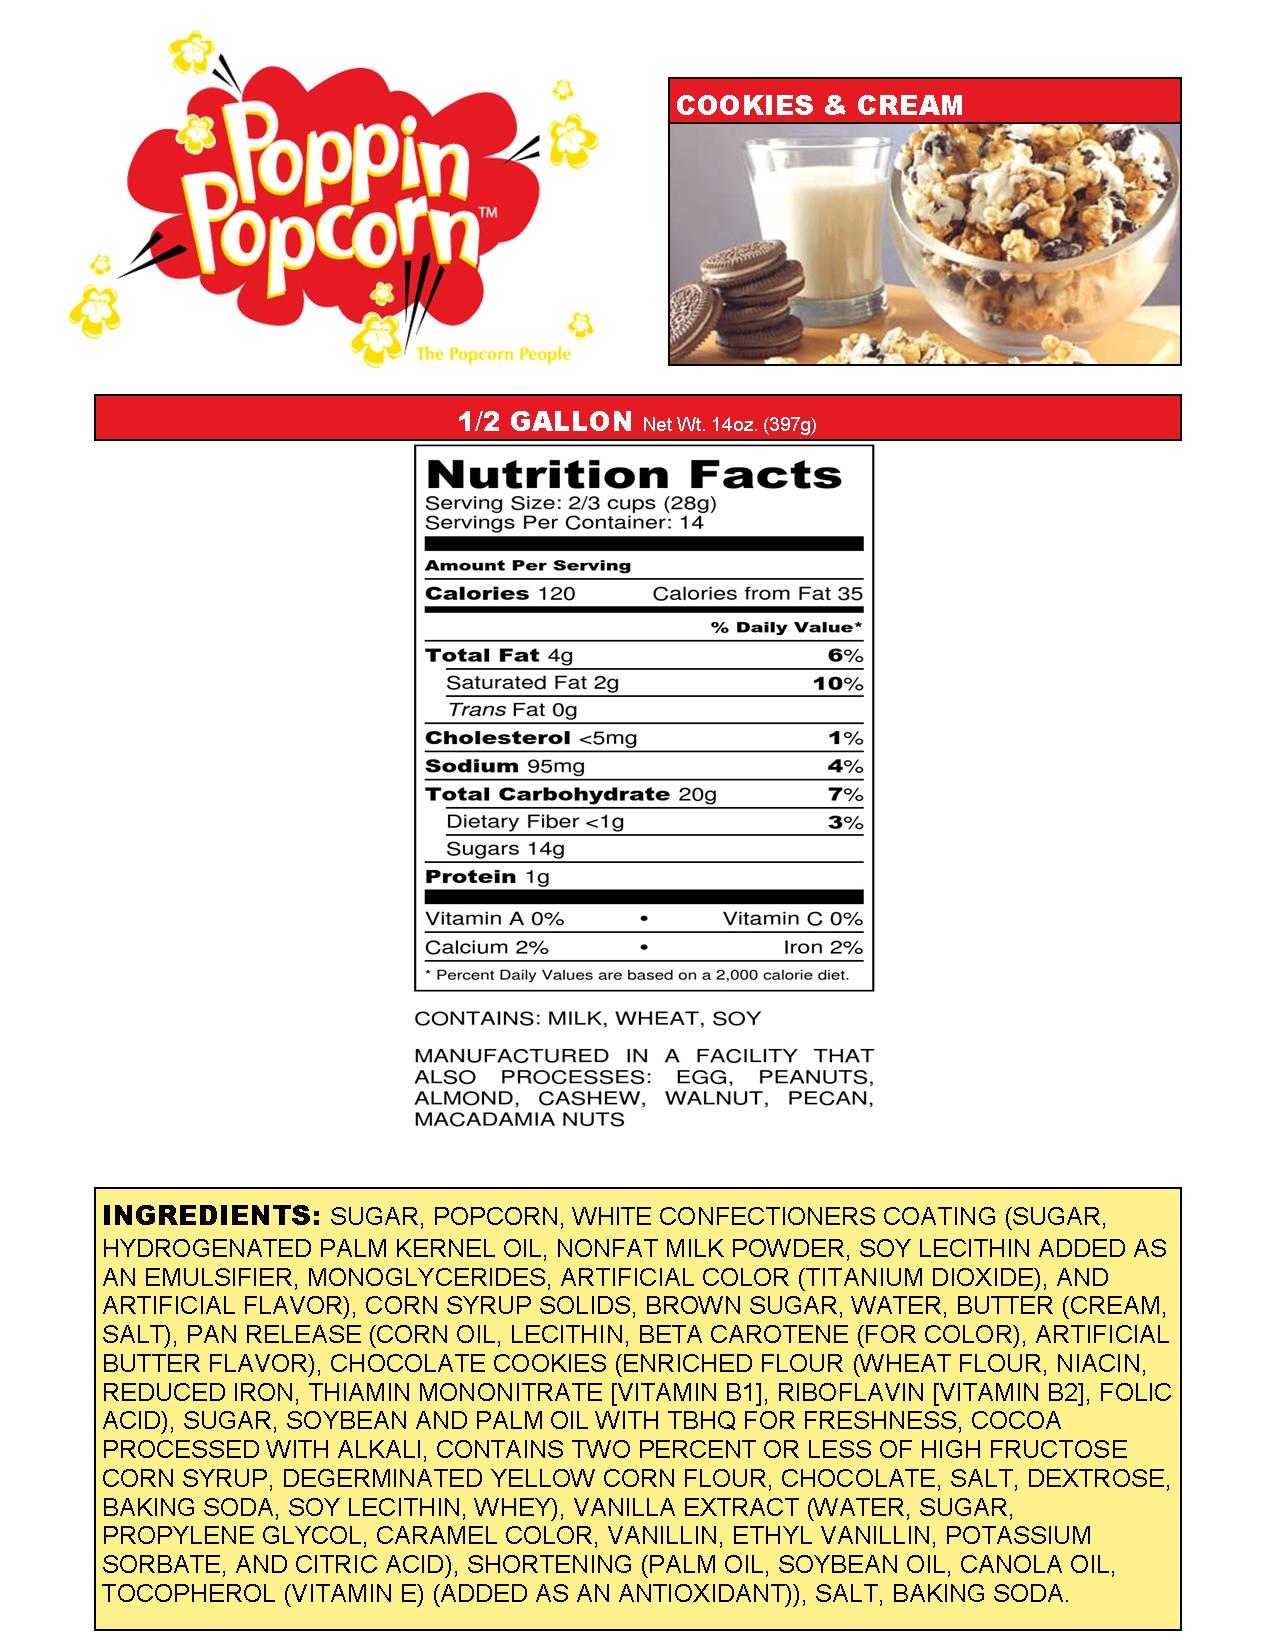 Cookies & Cream Web Nutritional